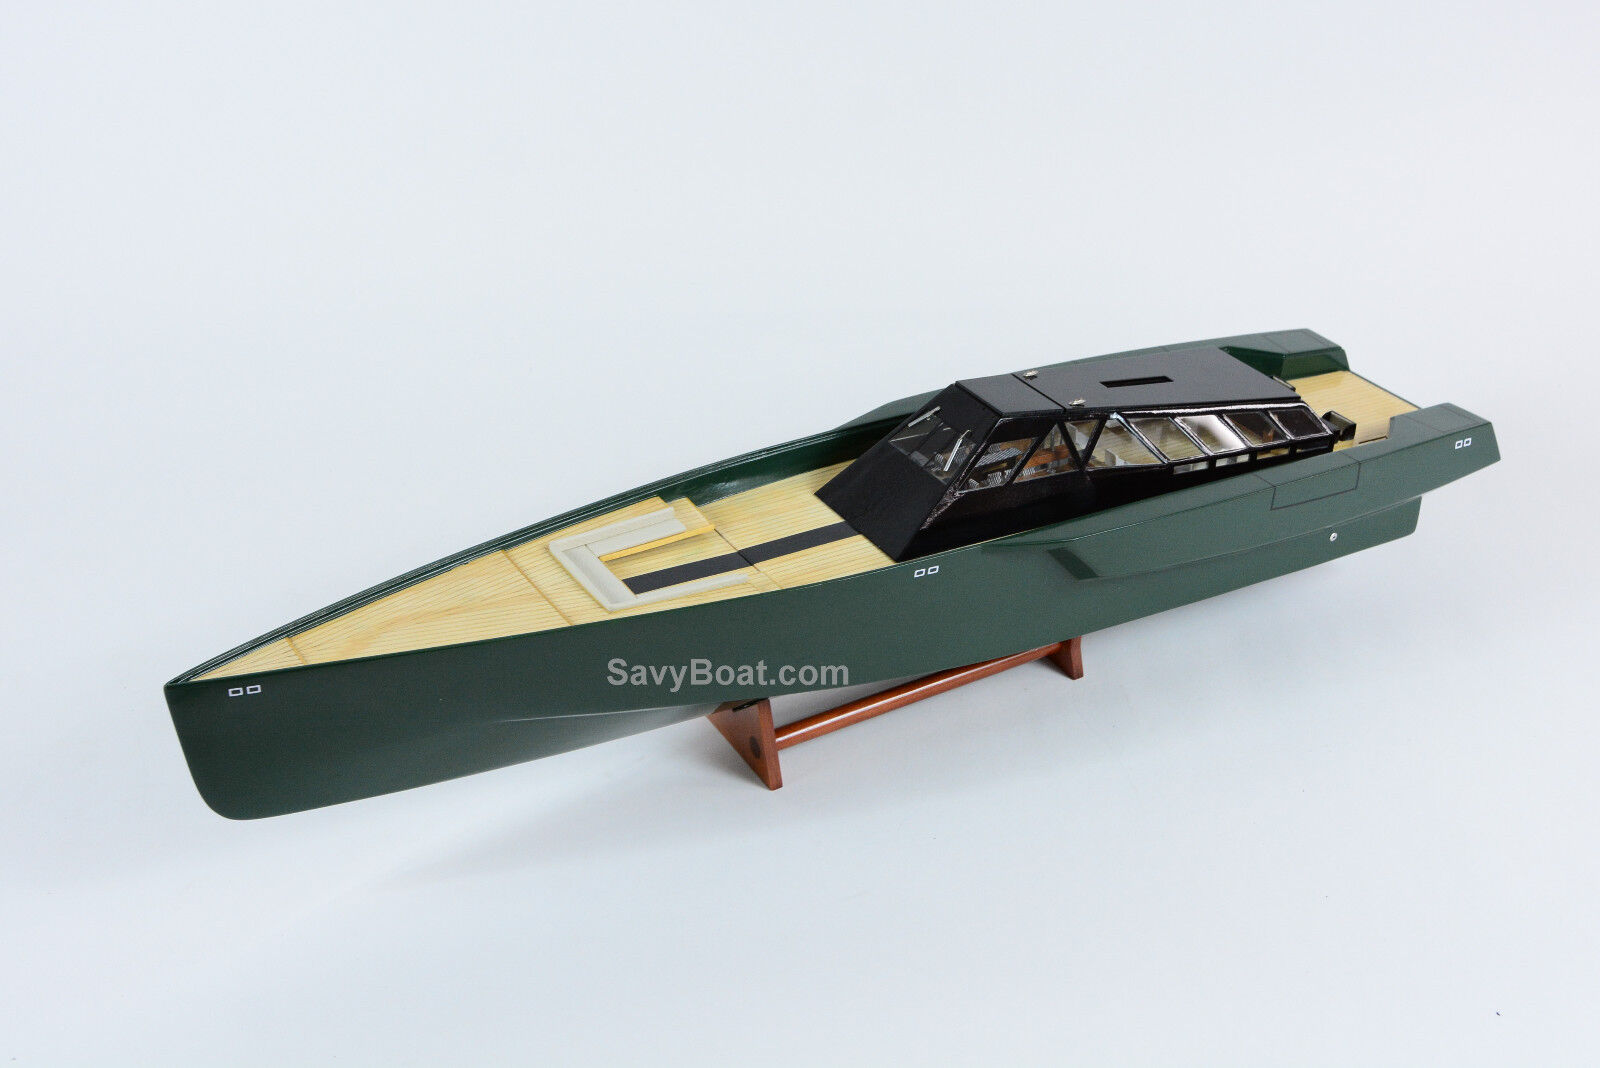 118 Wtuttiy energia Luxury Motor Yacht Wooden  Race Boat modello RC Ready 36   risparmia fino al 70%